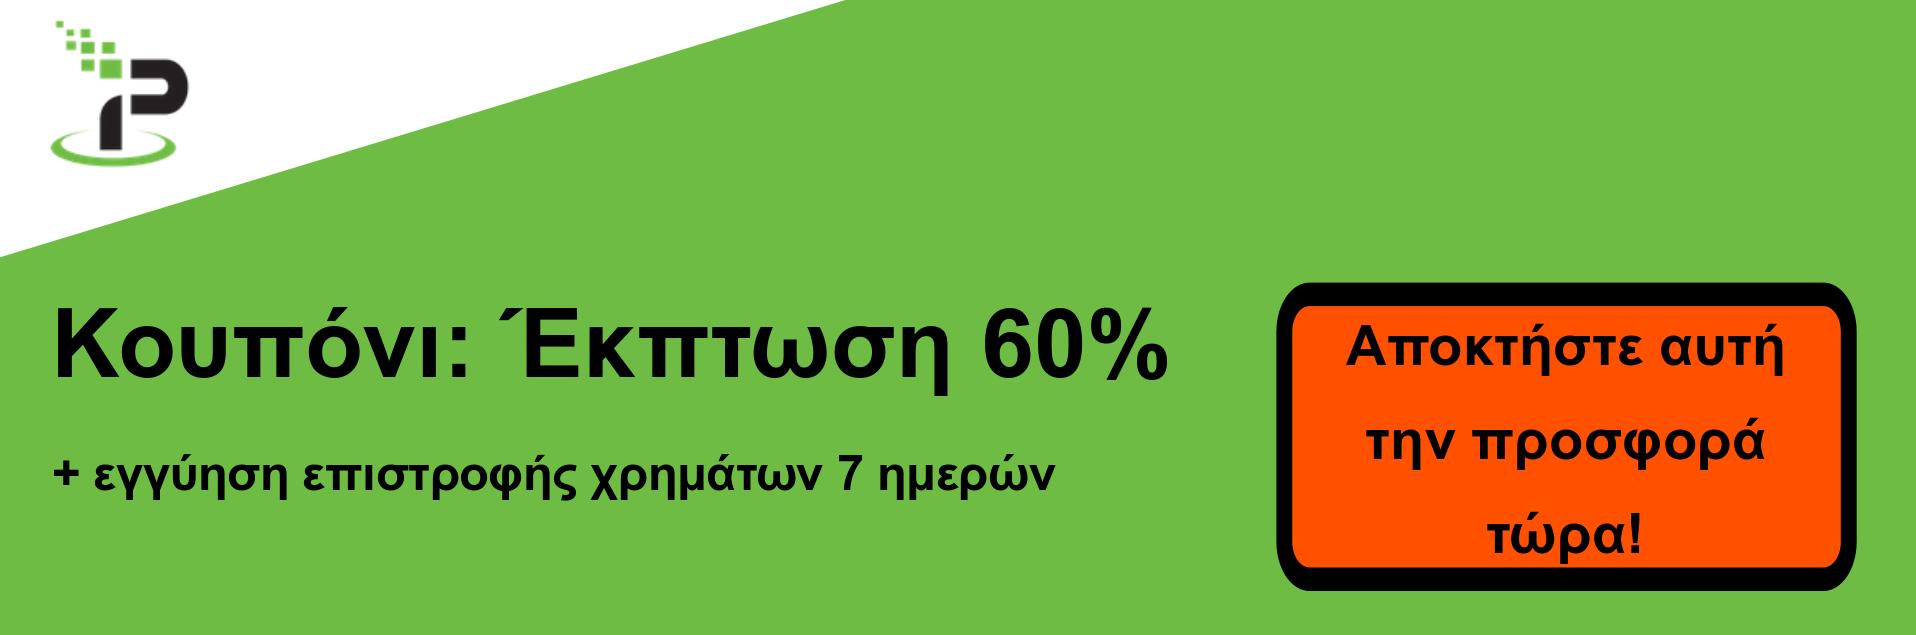 IPVanish κουπόνι banner - έκπτωση 60%